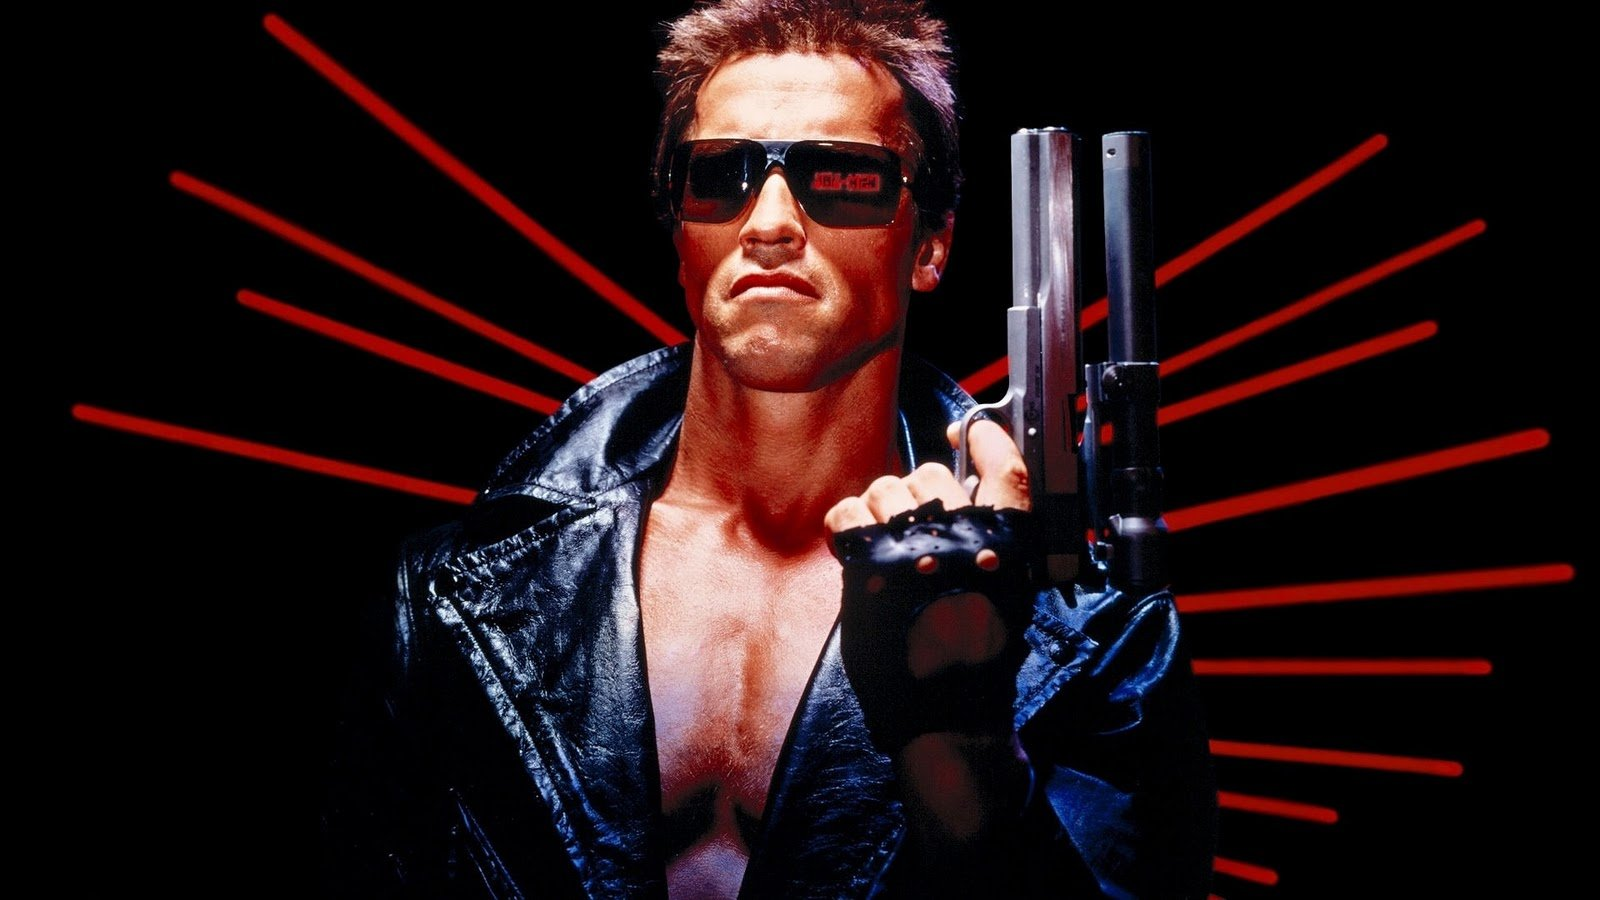 The Terminator Film Review